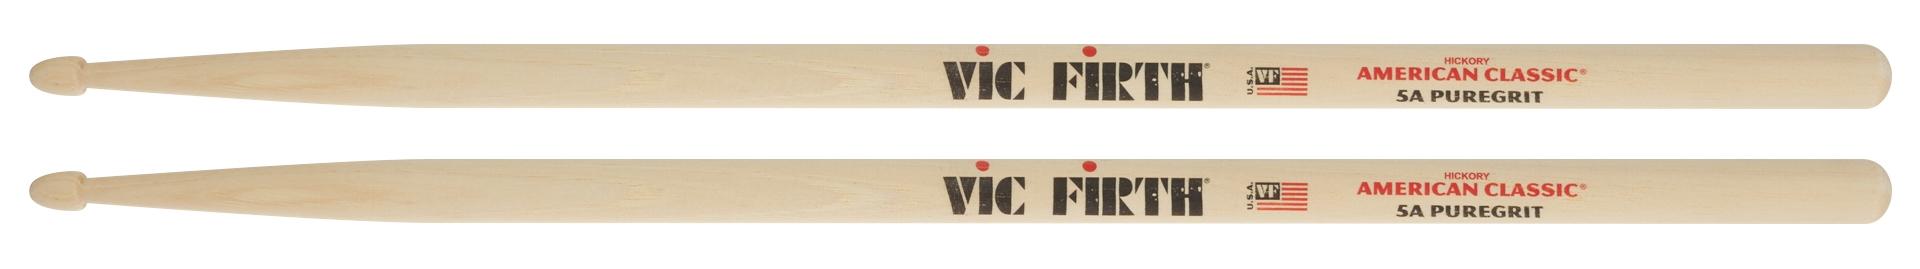 VIC FIRTH 5A Puregrit